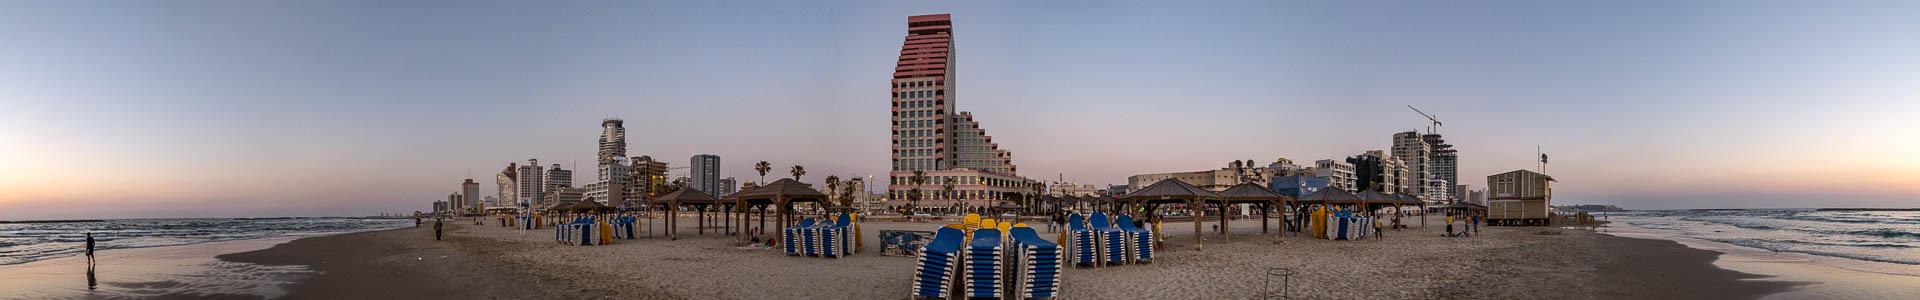 Tel Aviv Mittelmeer, Strand und Skyline